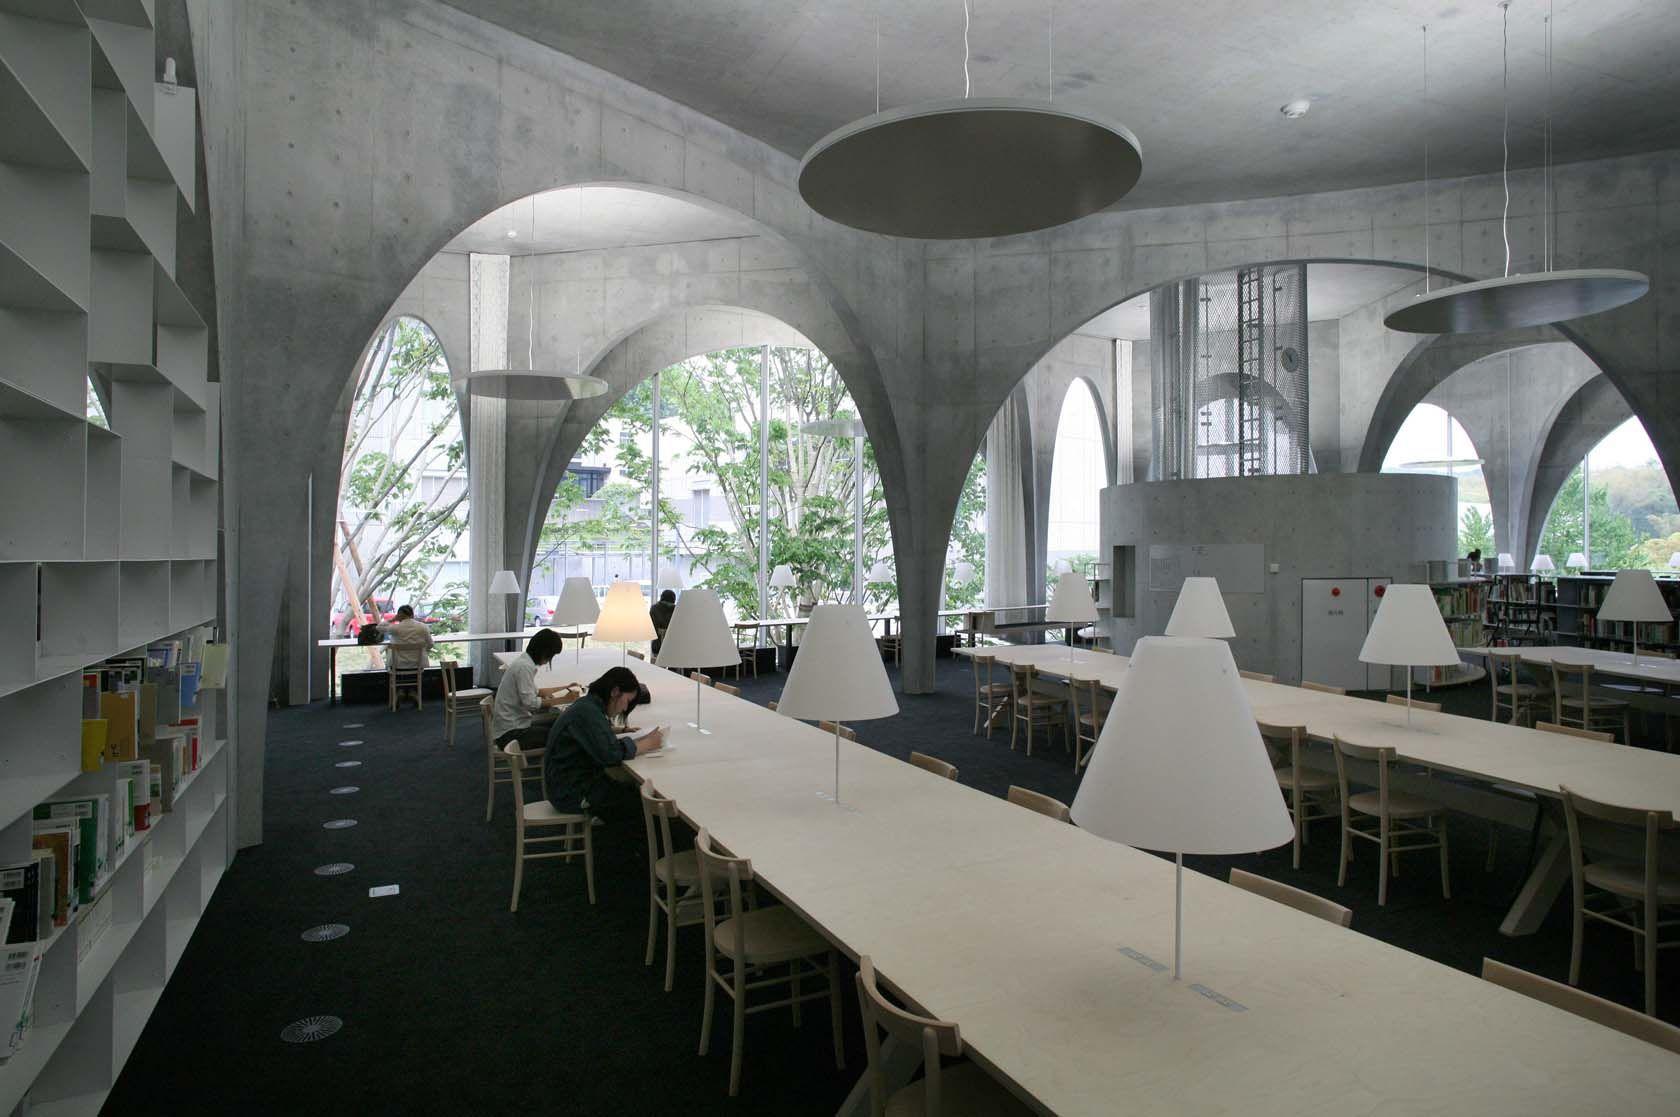 Tama Art University Library Hachioji Campus Shi Tokyo Japan Photo By Tomio Ohashi